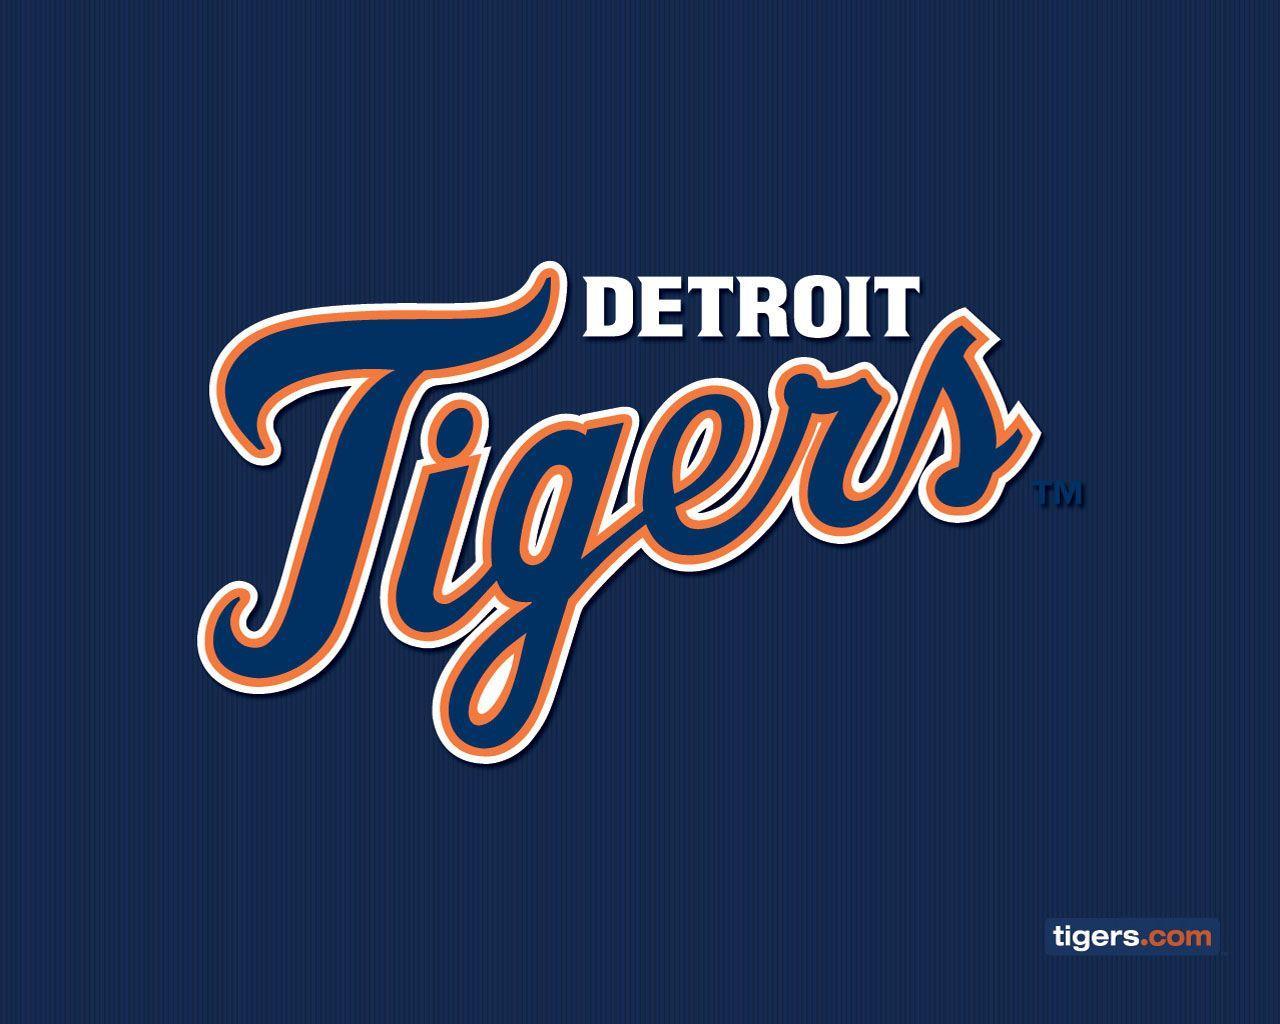 Detroit Tigers Wallpapers Wallpaper Cave